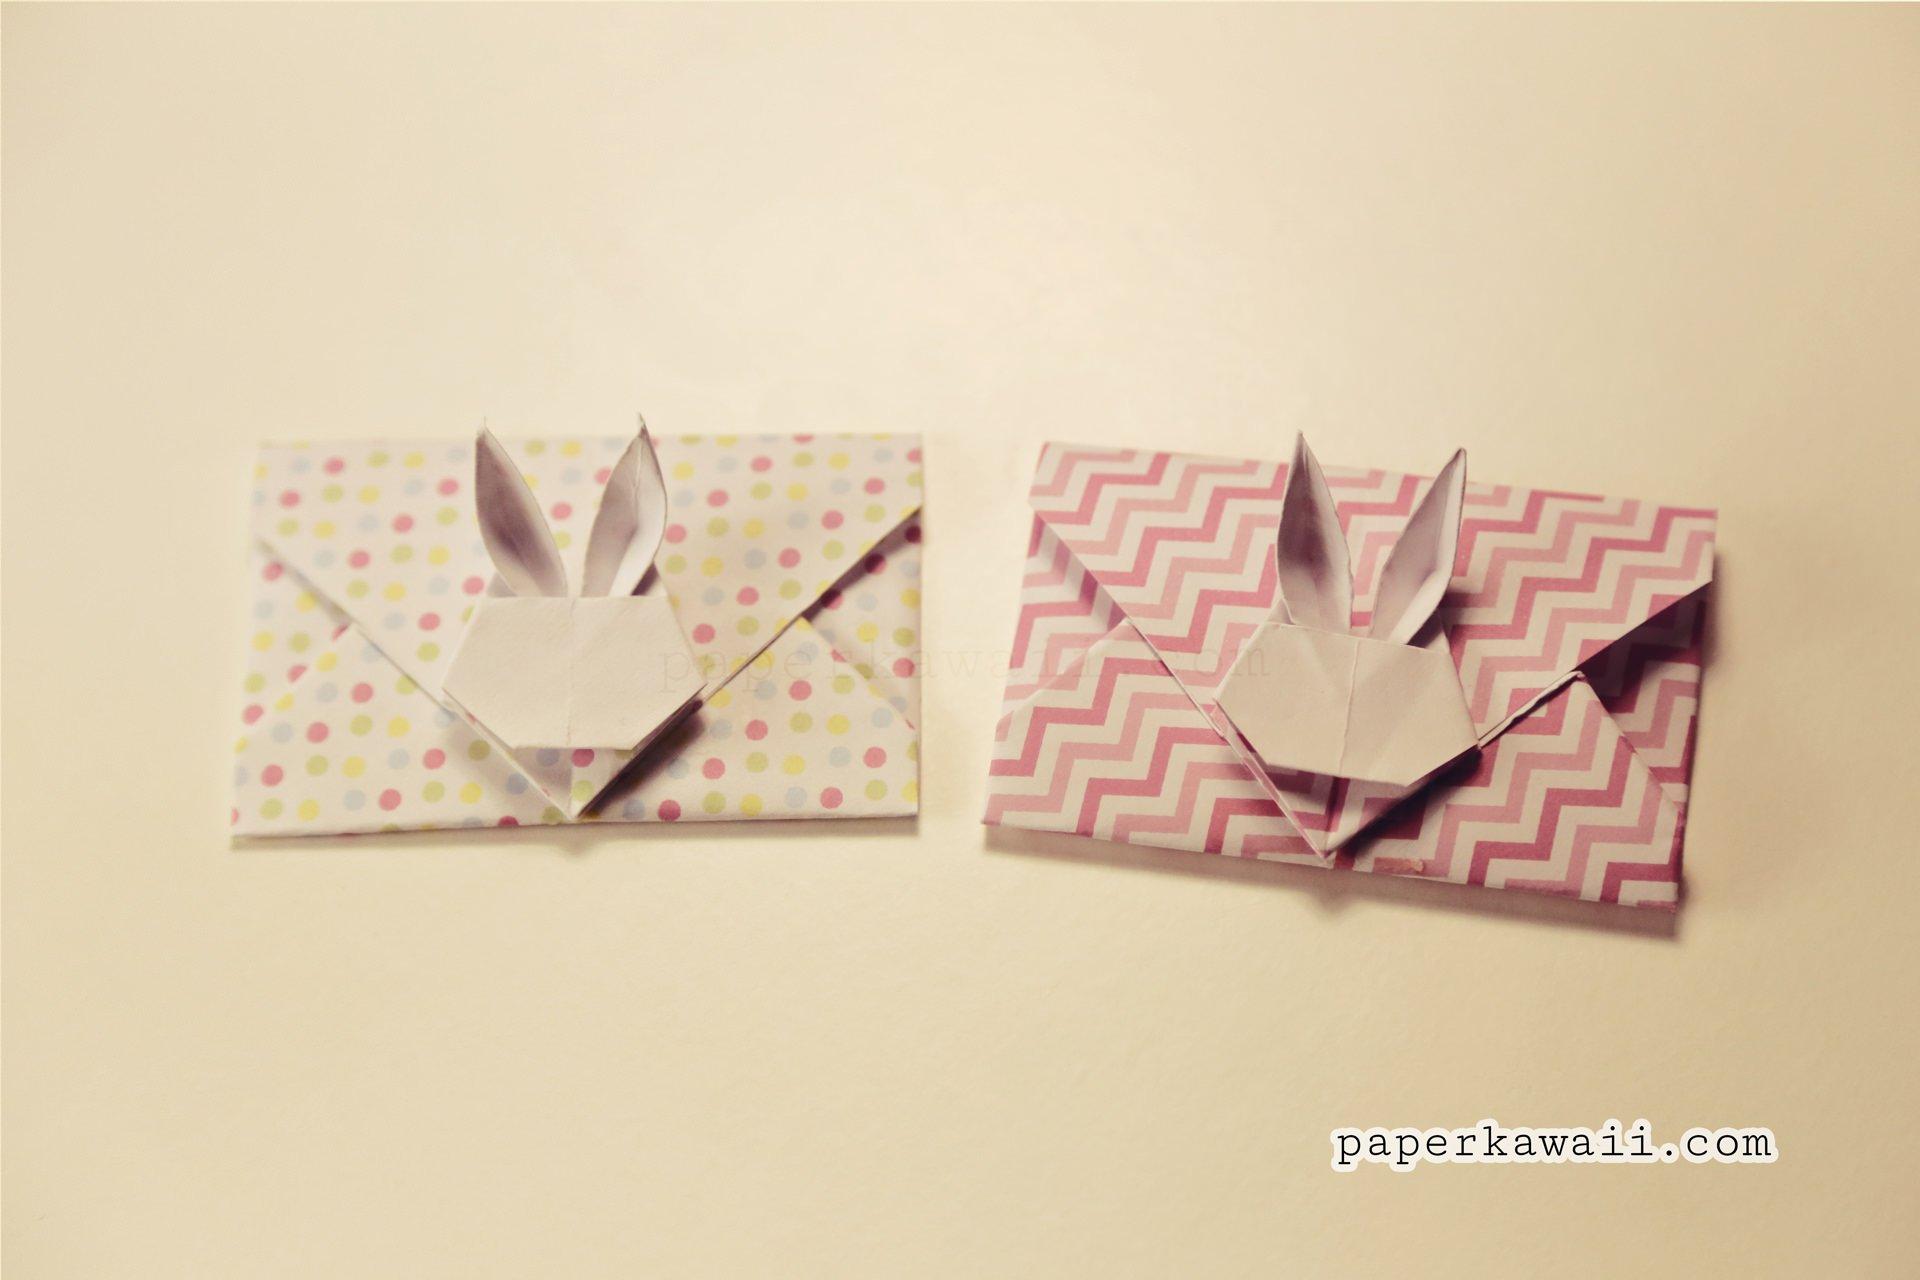 Origami bamboo letterfold folding instructions - Origami Bunny Rabbit Envelope Tutorial V2